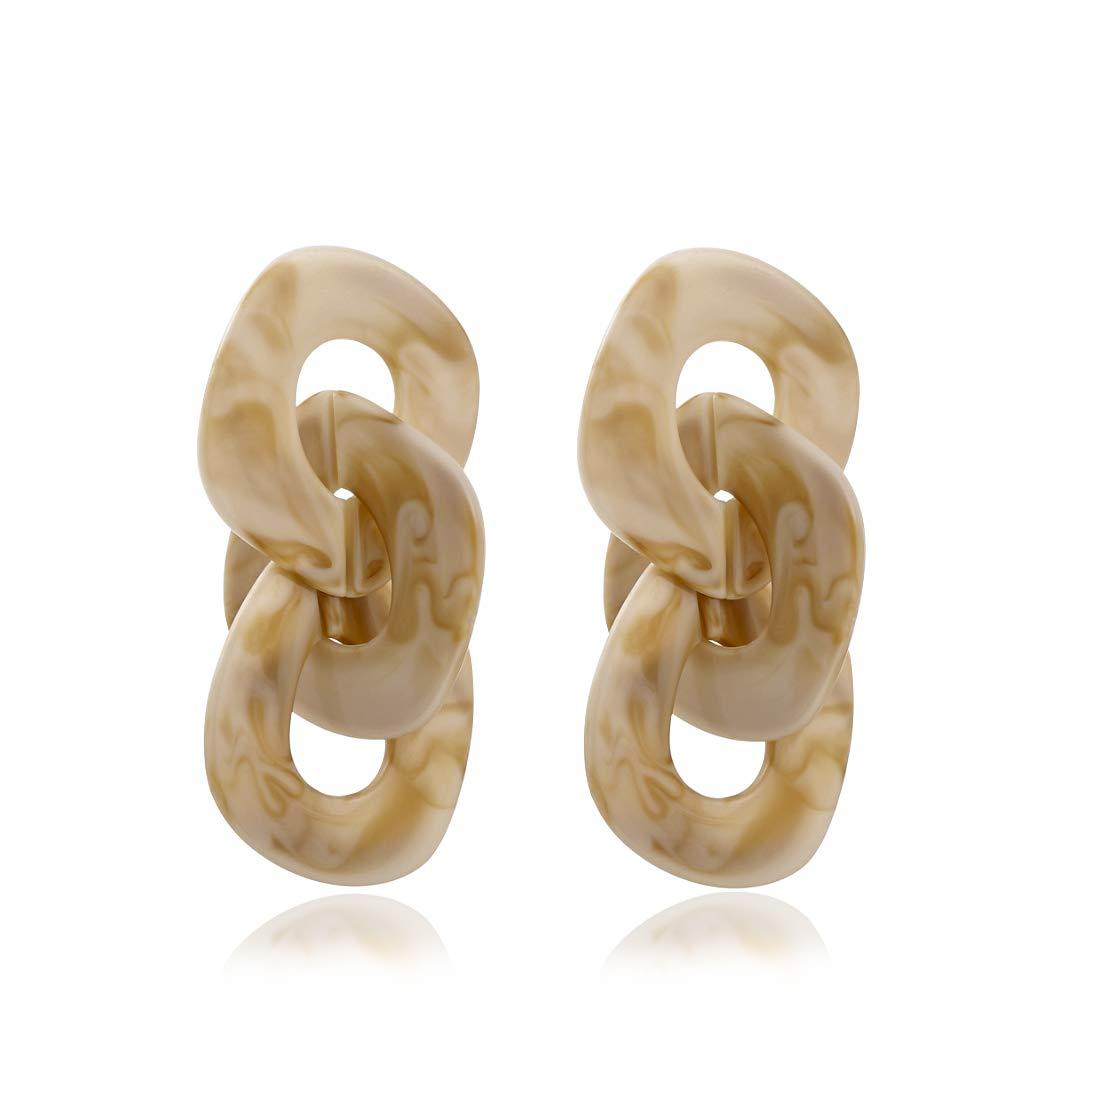 Acrylic Chunky Chain Links Geometric Drop Earrings KELMALL COLLECTION